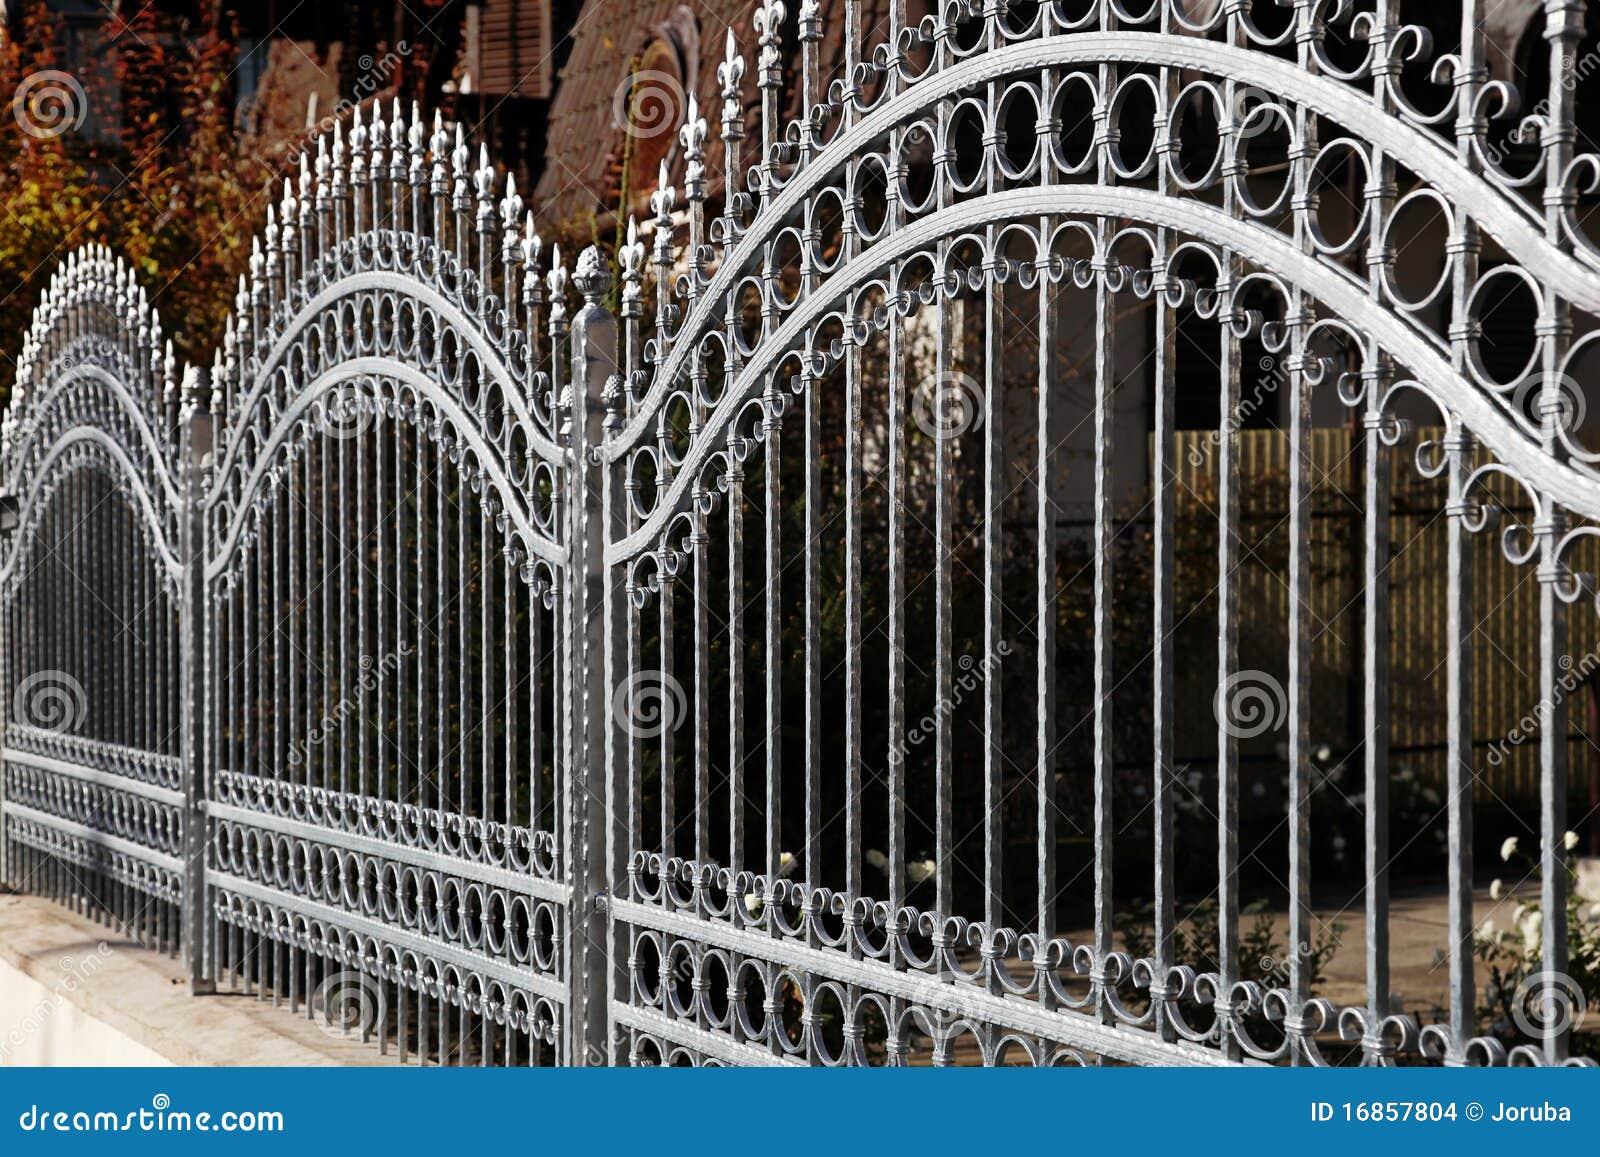 Forged iron fence stock images   image: 16857804